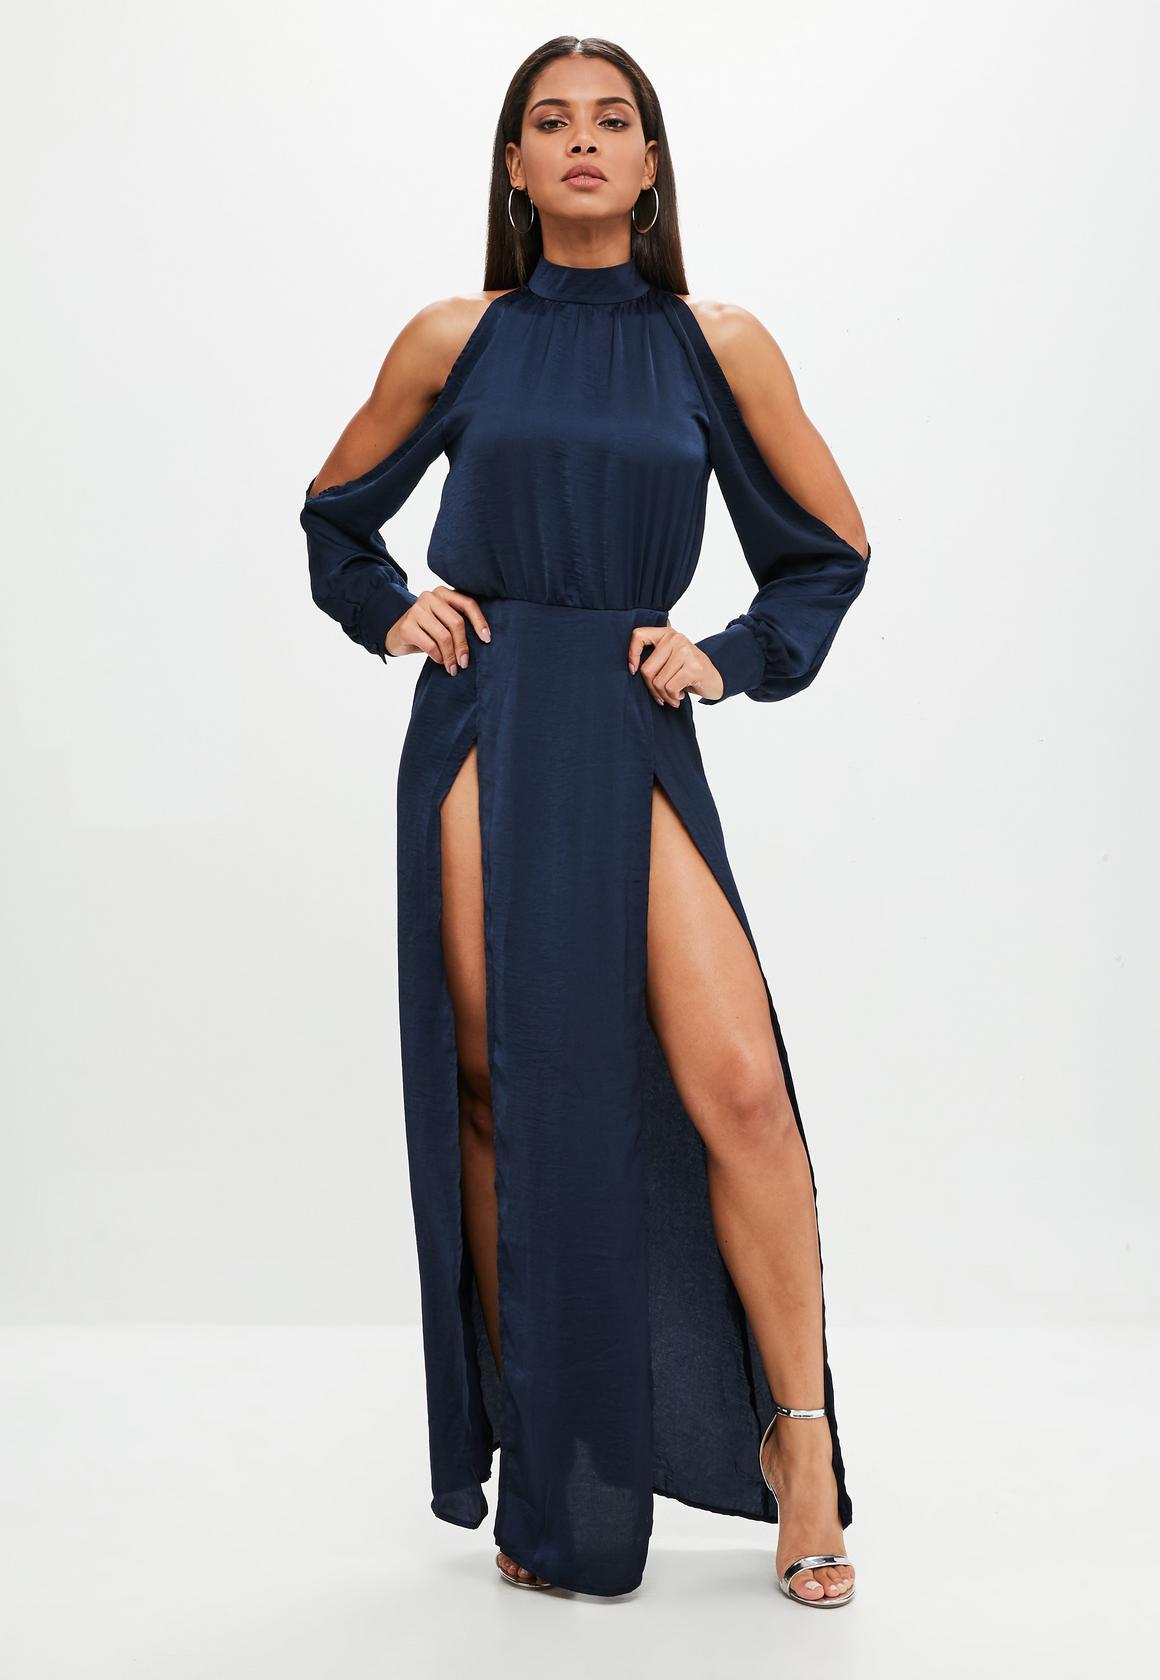 Shop online for Navy Split Front Maxi Dress